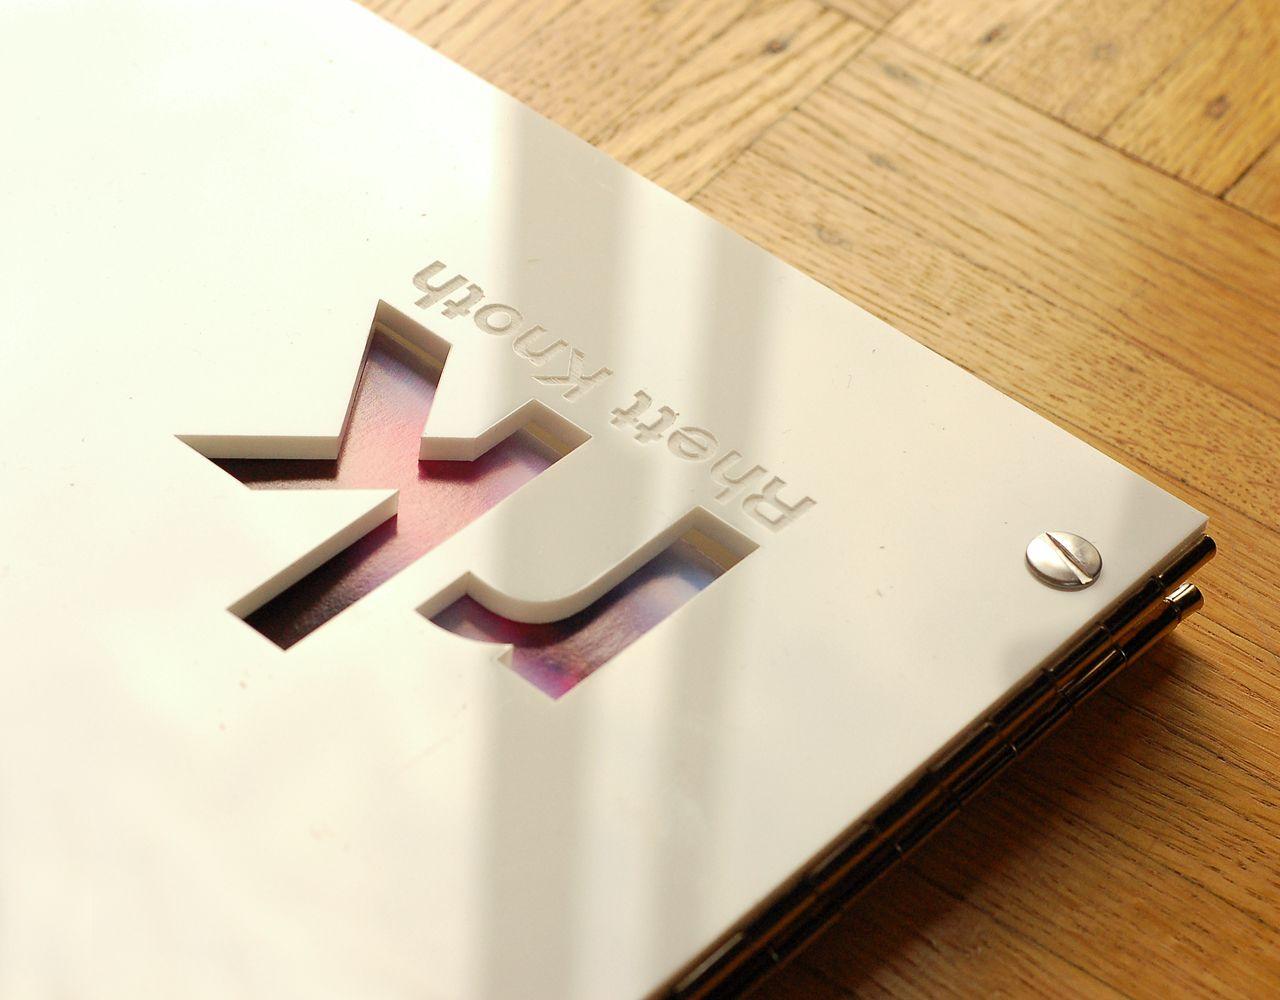 Pin by bintang auralia on graphic design interior design - Graphic design for interior designers ...